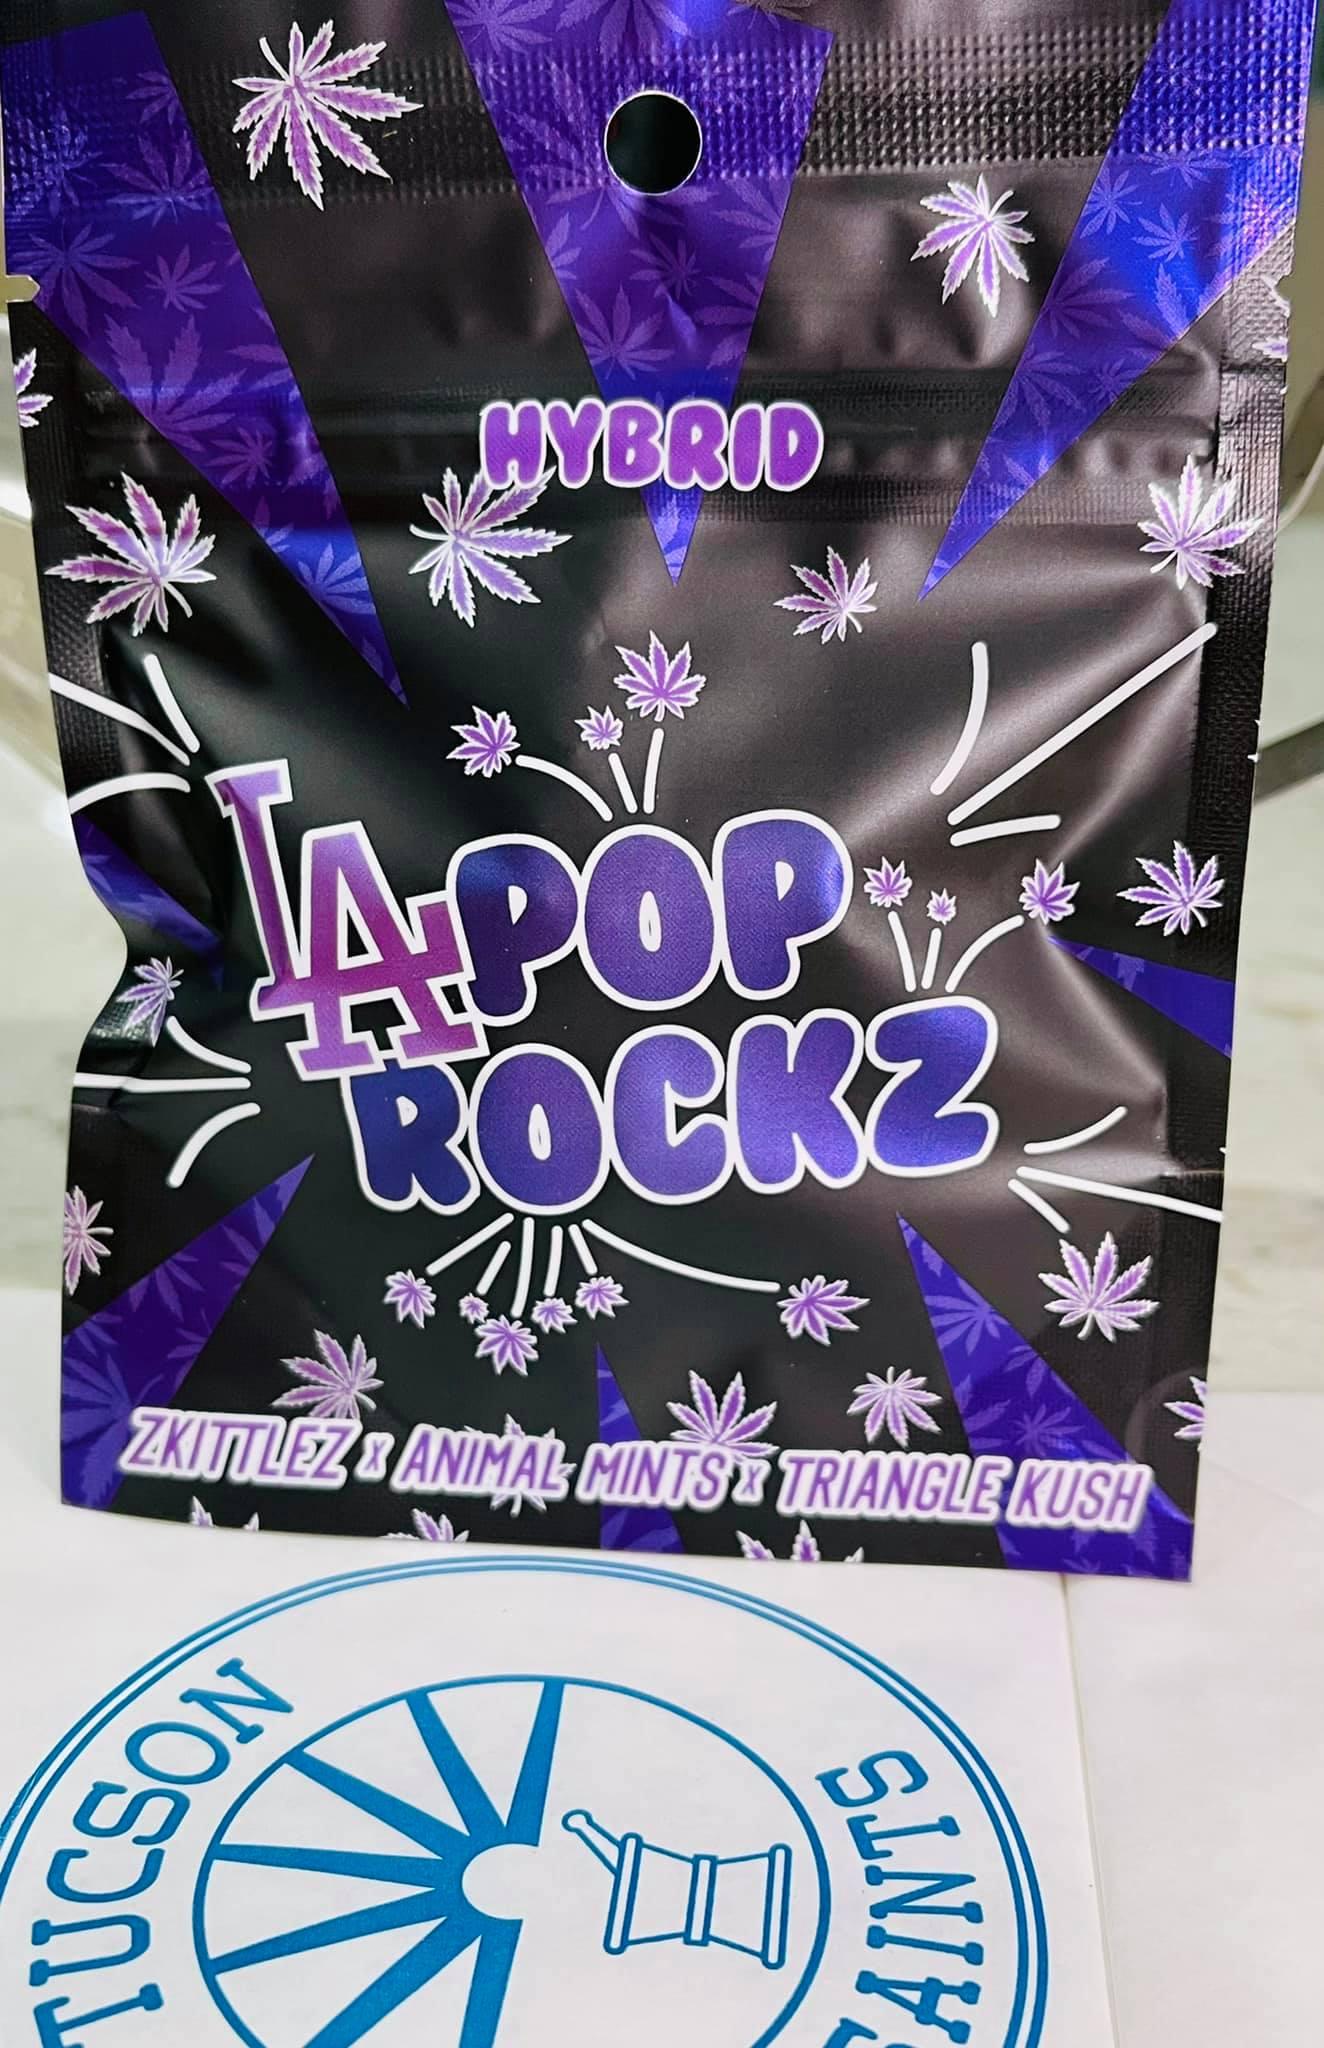 LA POP ROCKZ hybrid zkittlez animal Mints Triangle Kush